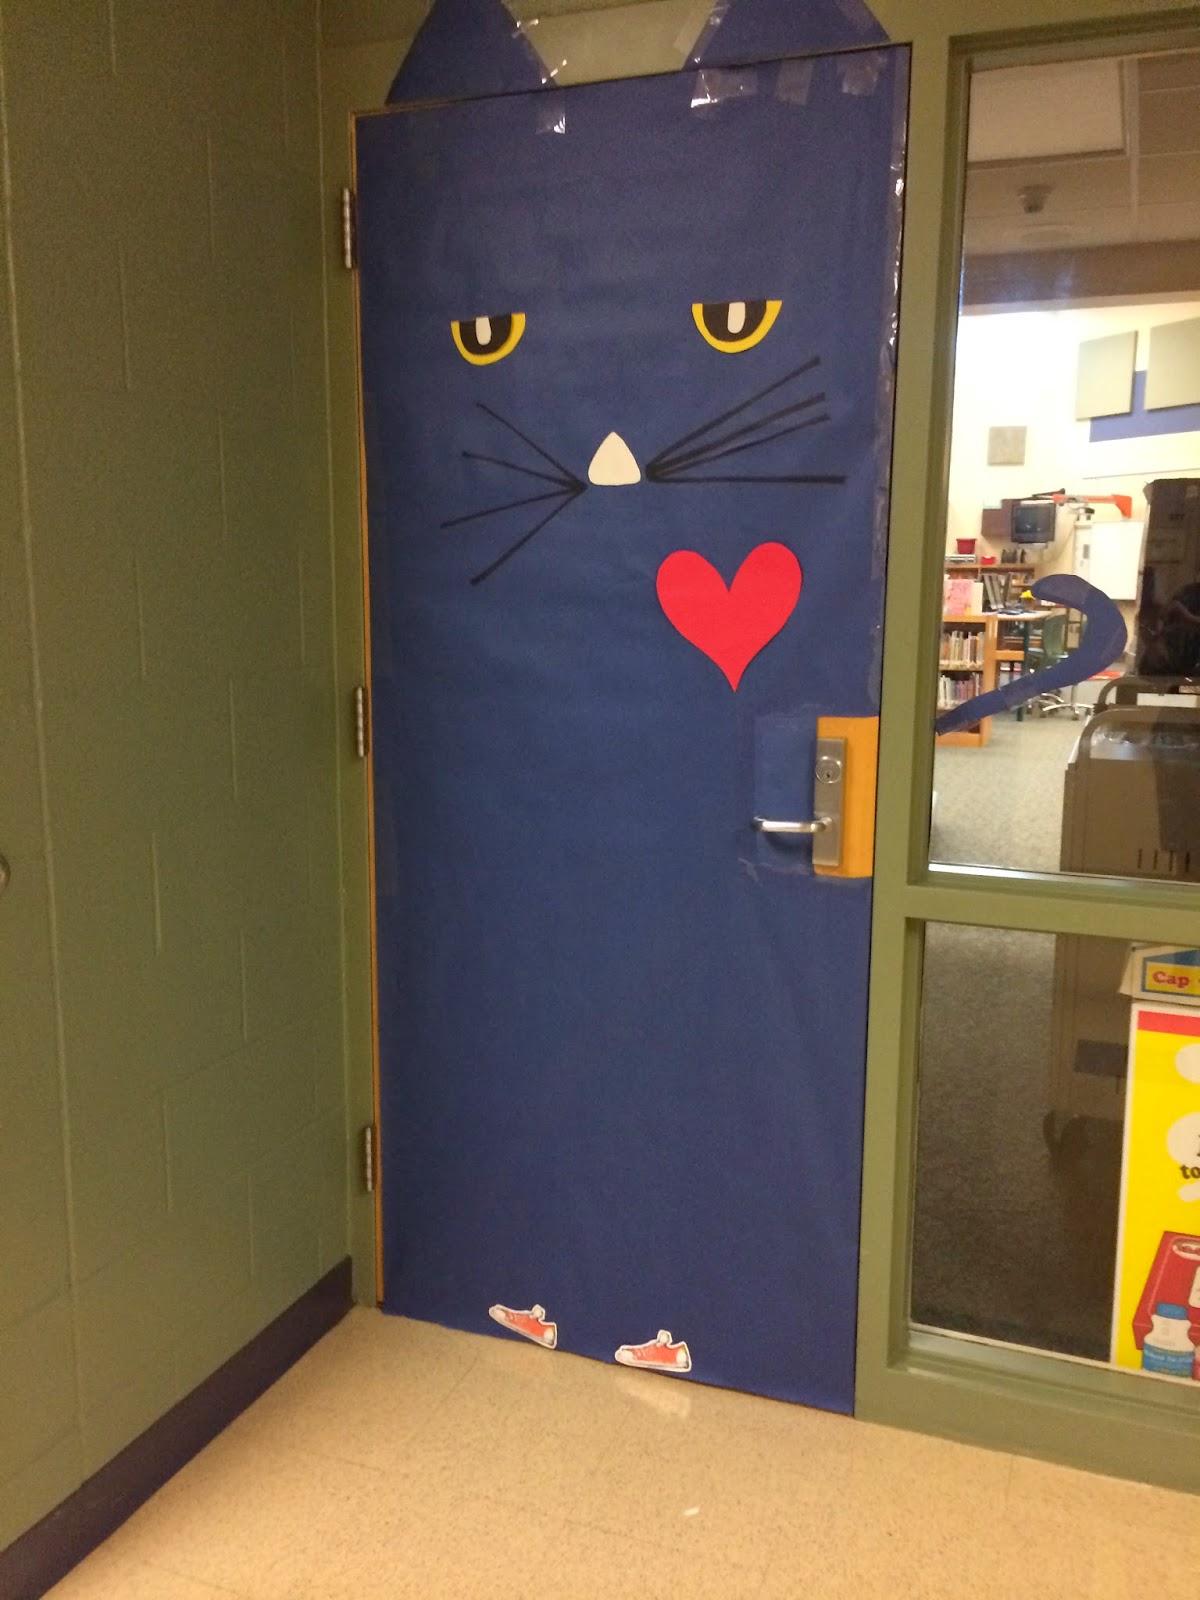 Iu0027ve Been Busy At School. Decorating My Door Like Pete The Cat